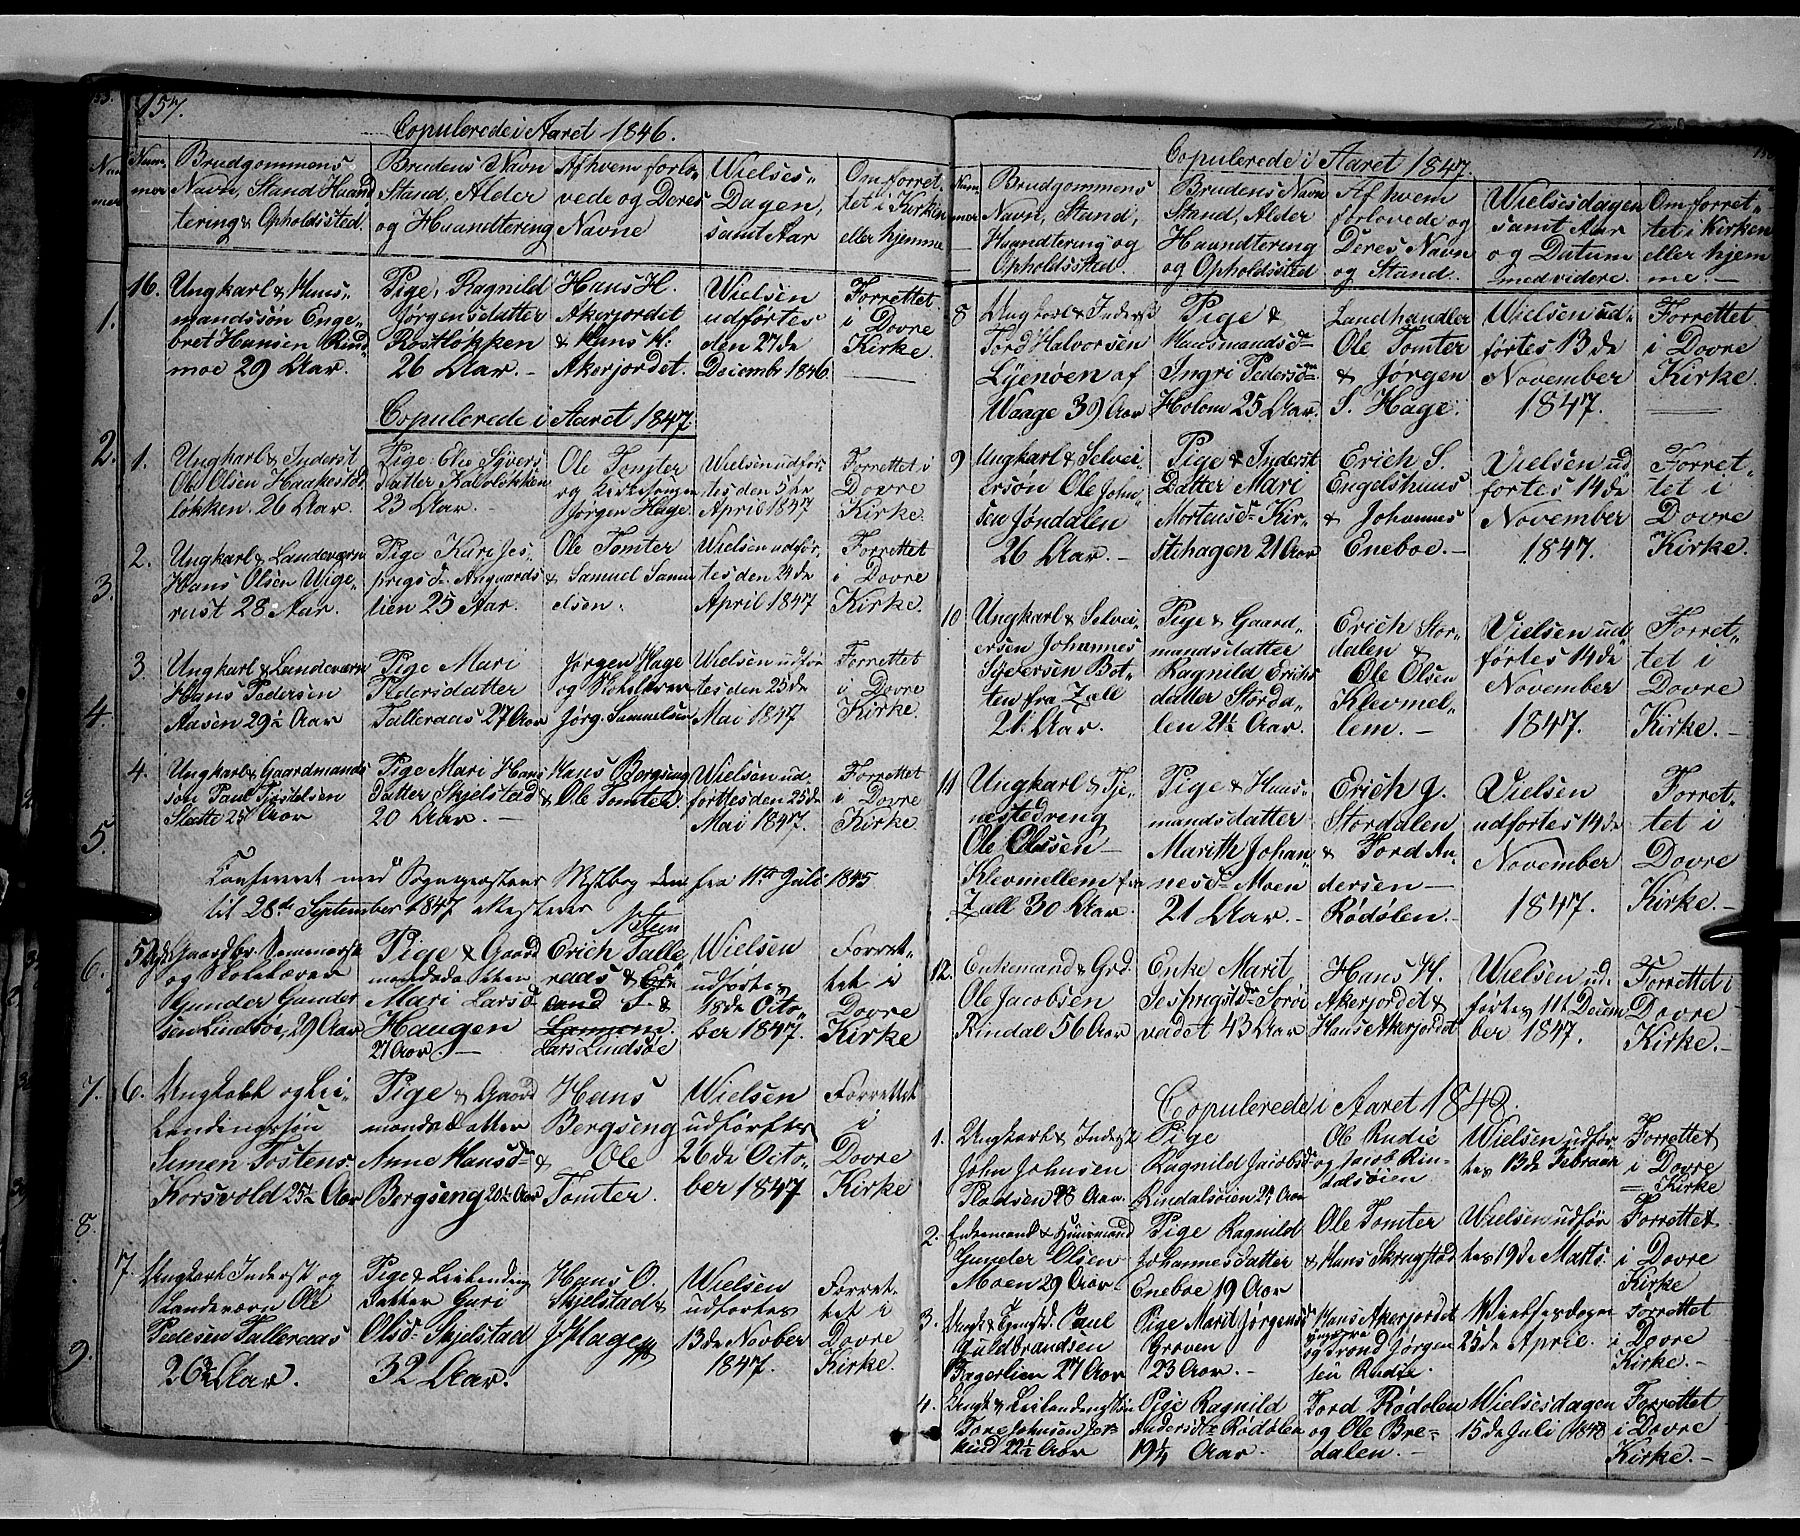 SAH, Lesja prestekontor, Klokkerbok nr. 3, 1842-1862, s. 157-158